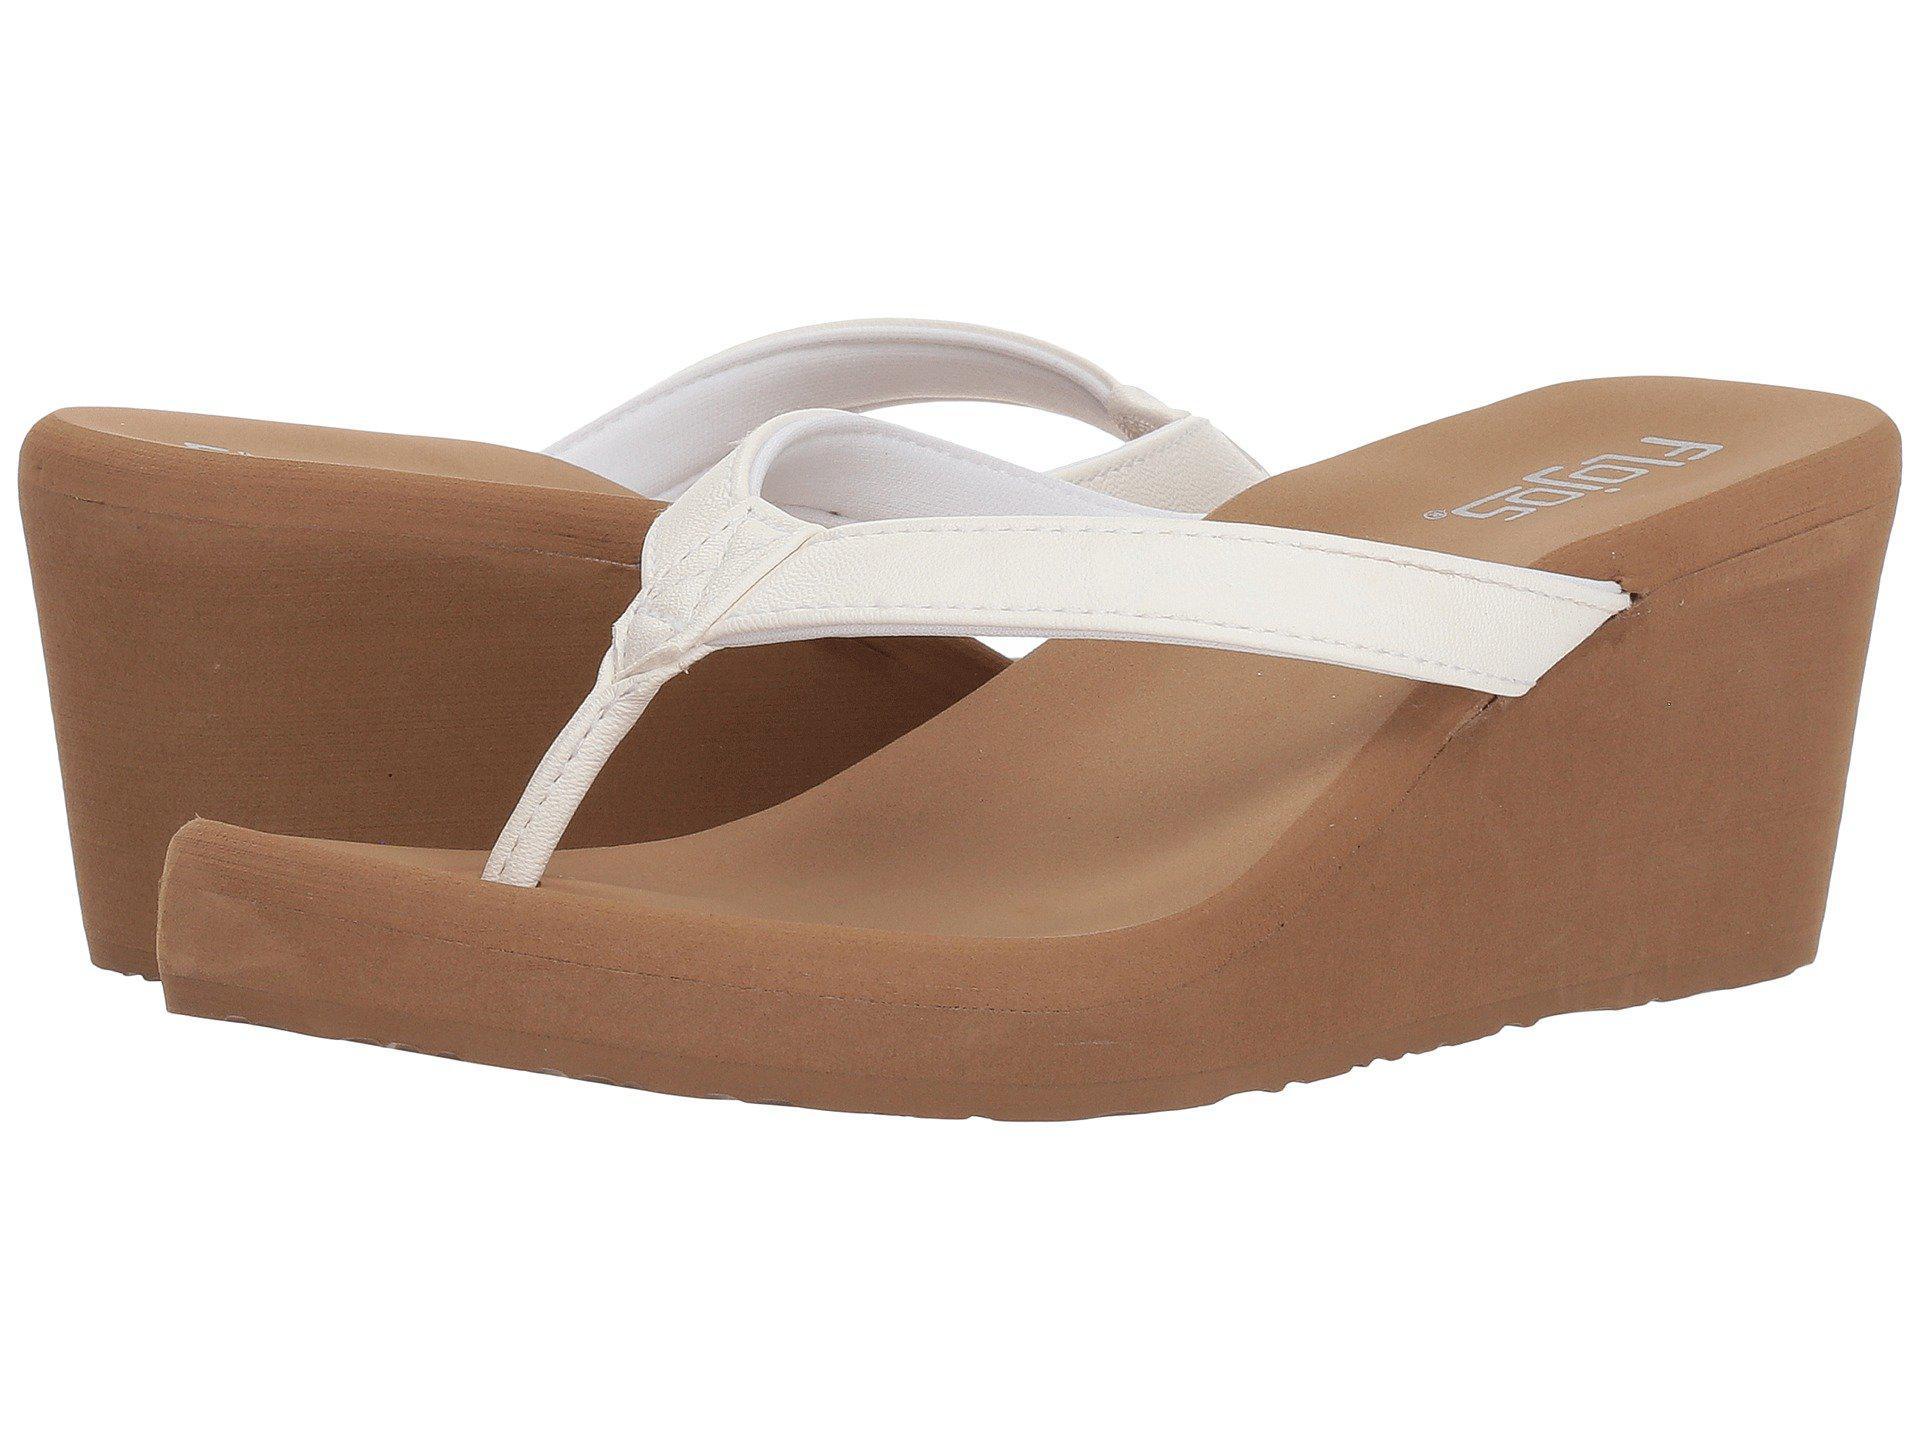 ab178199ba29a1 Lyst - Flojos Olivia (black) Women s Sandals in White